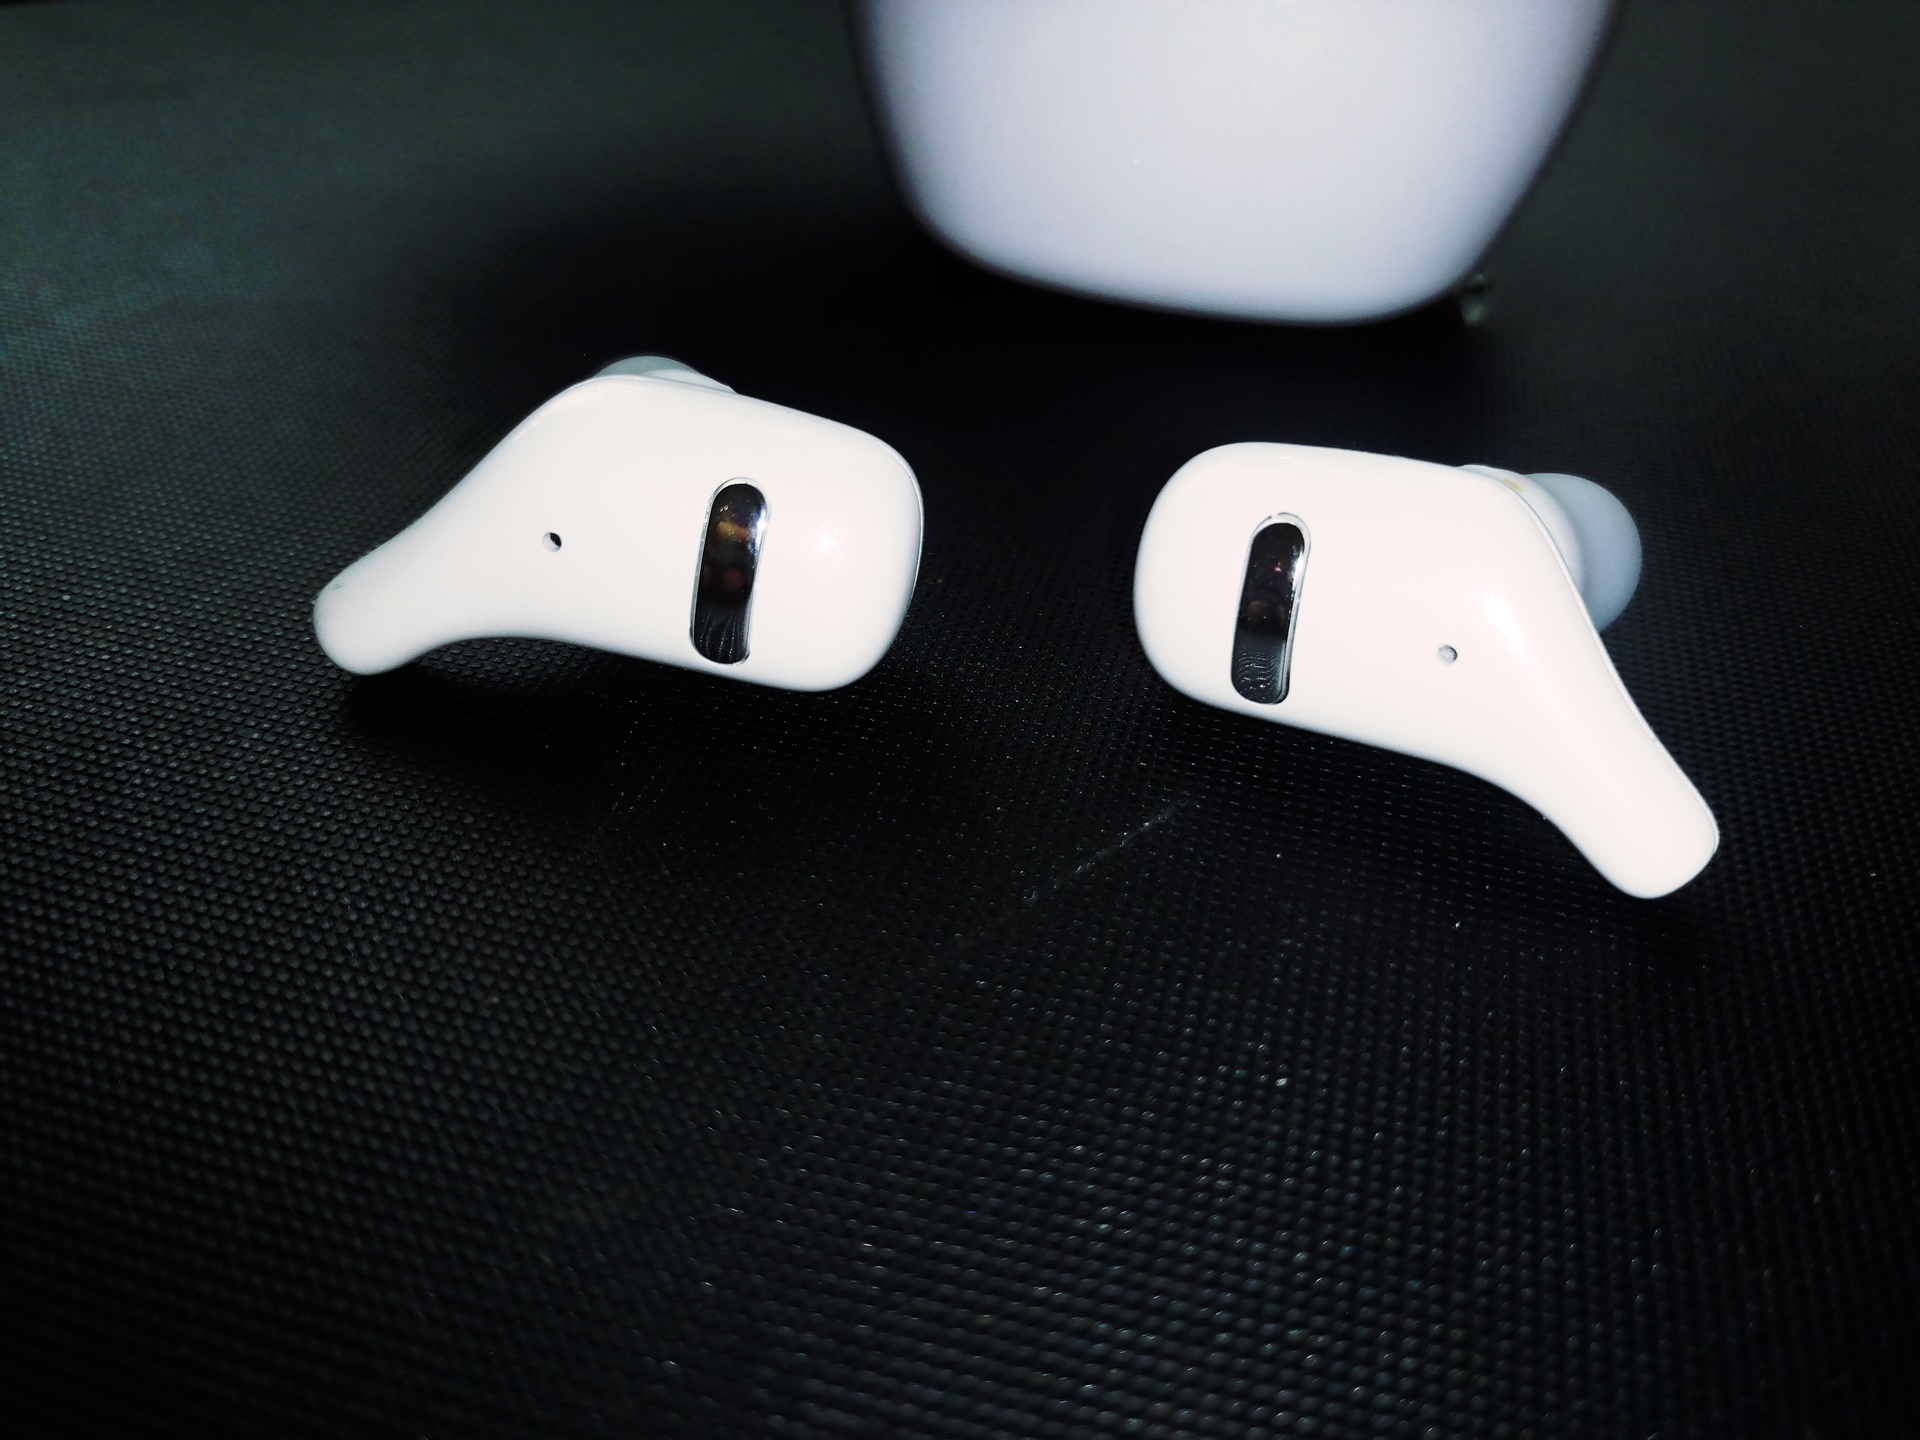 SZWYOR A2 TWS Earbuds design